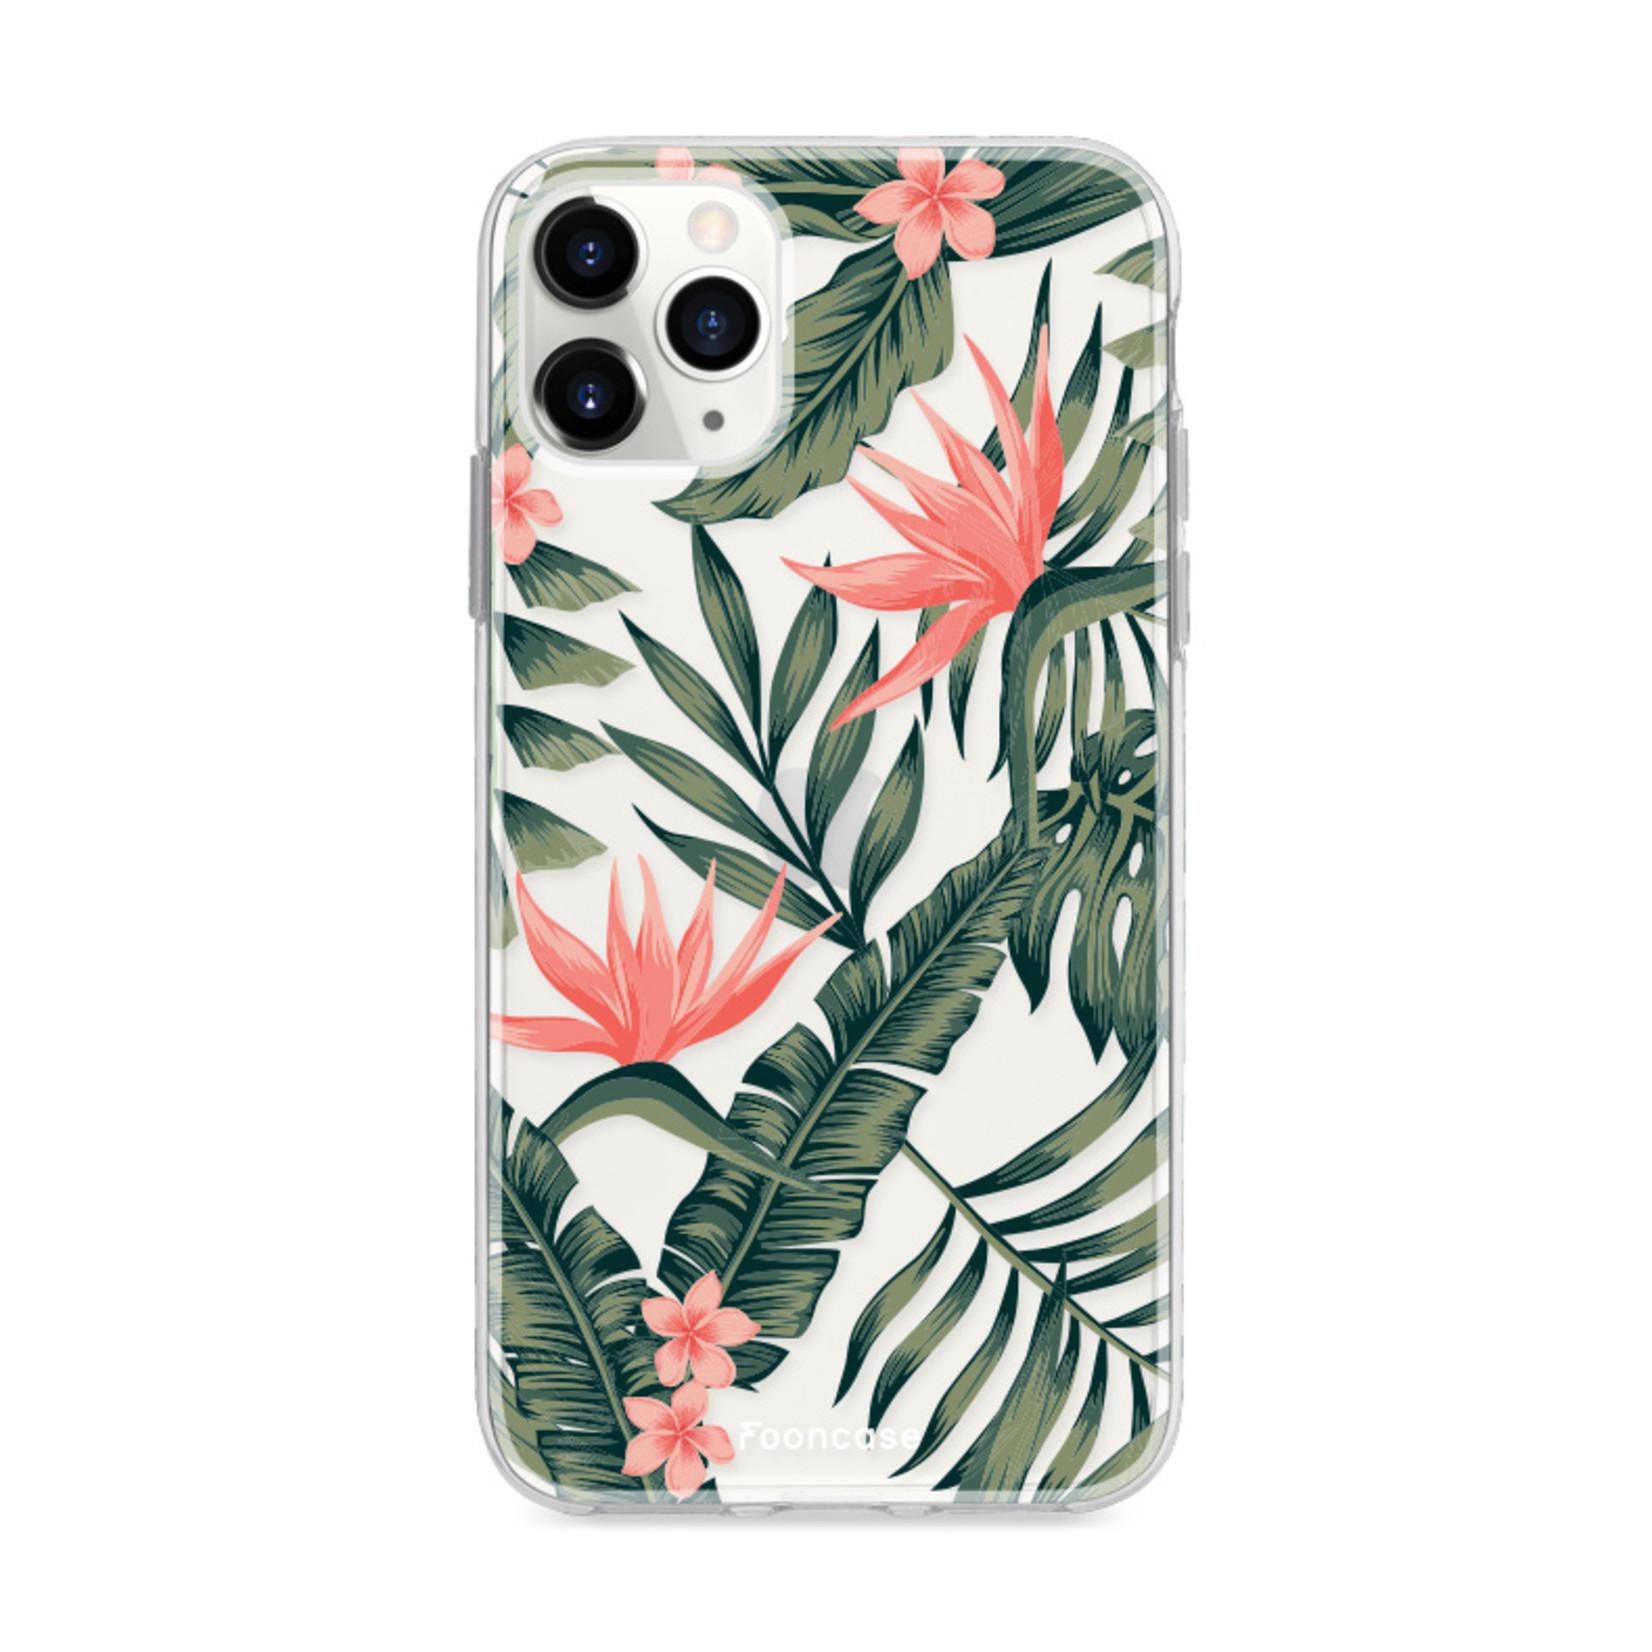 FOONCASE IPhone 11 Pro Handyhülle - Tropical Desire